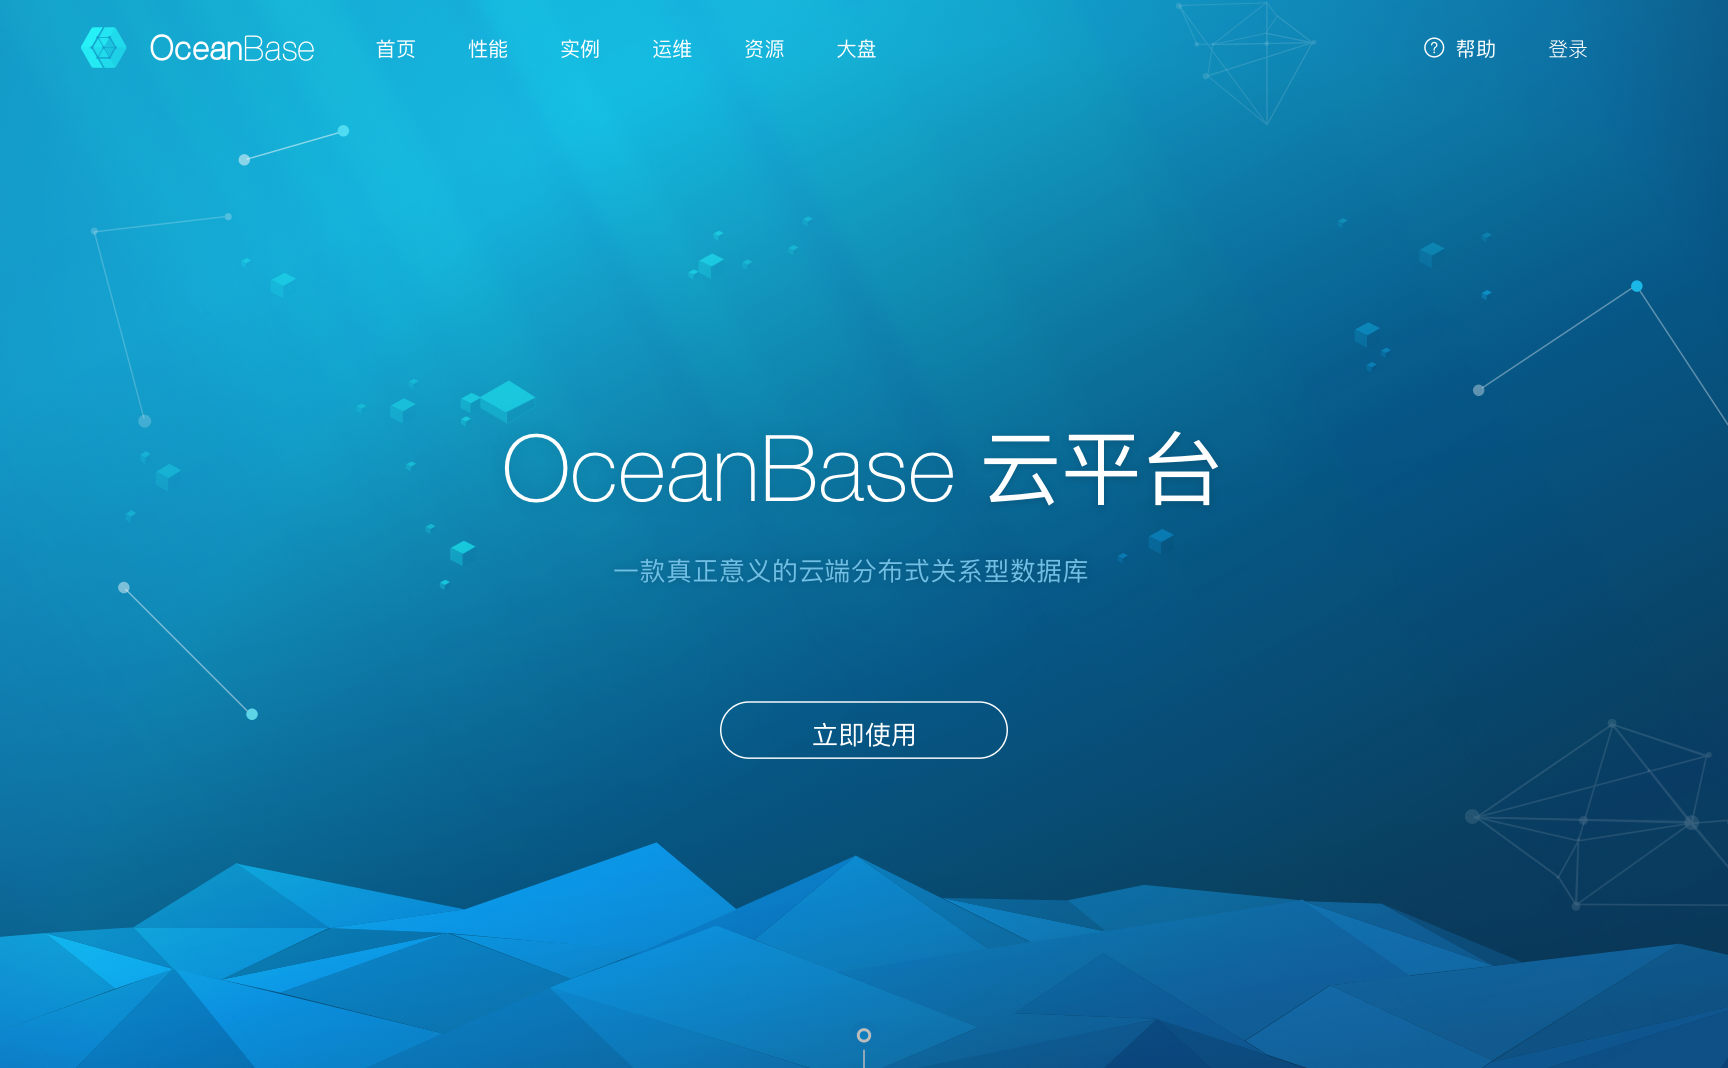 OceanBase Cloud Platform